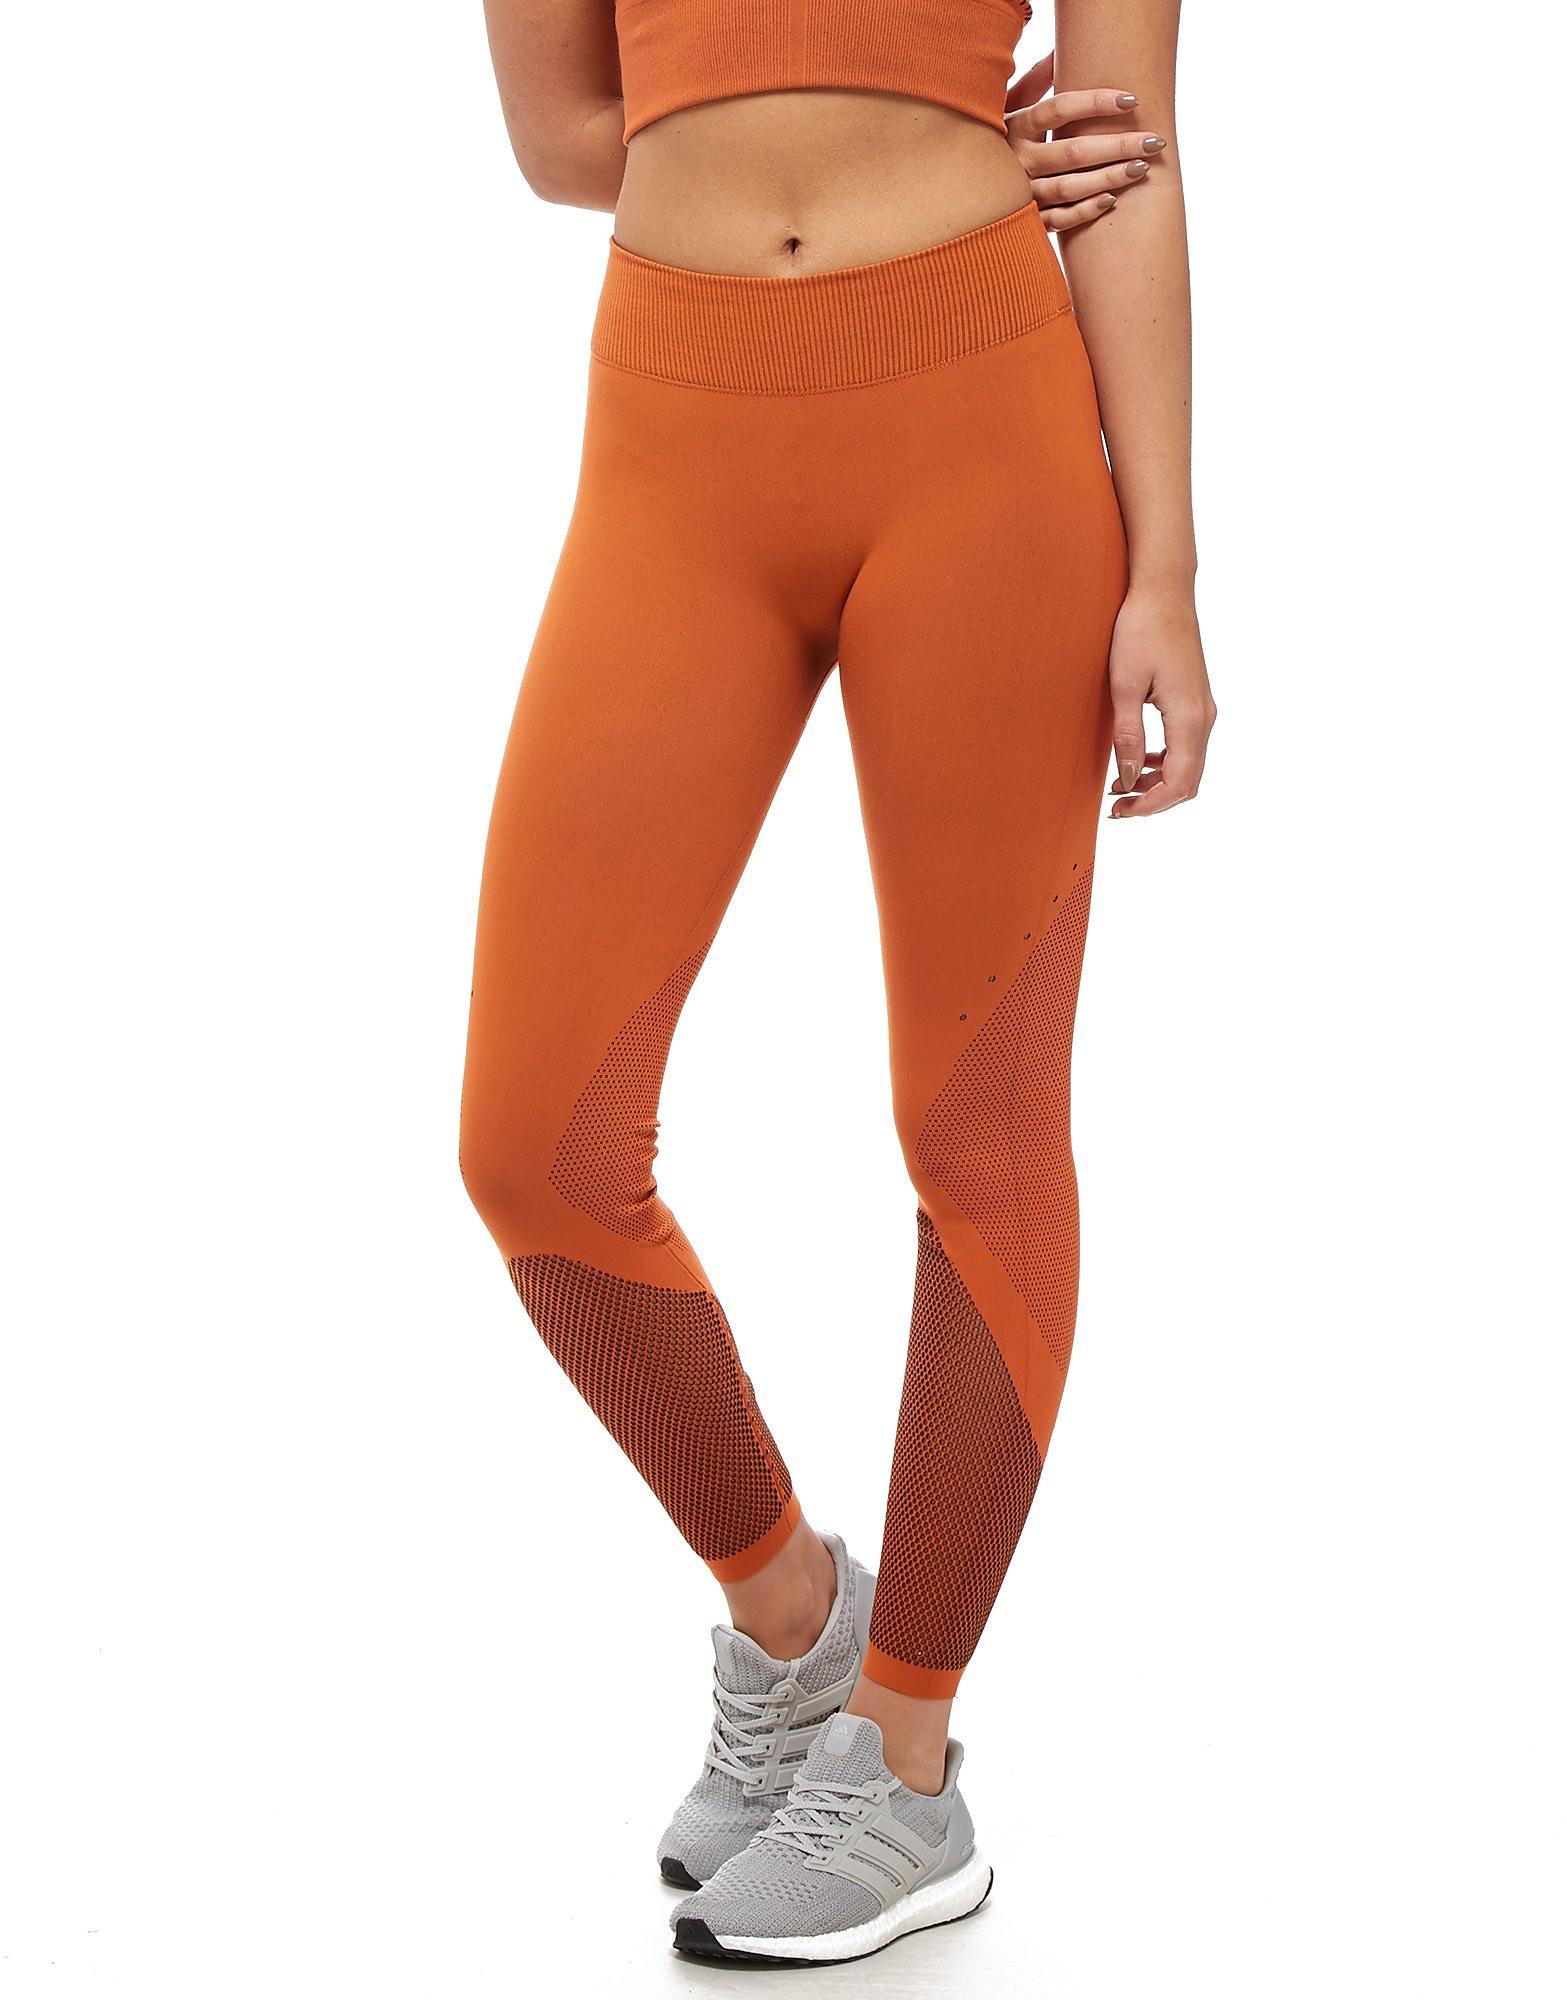 Adidas Fitness leggings mujeres JD Sports